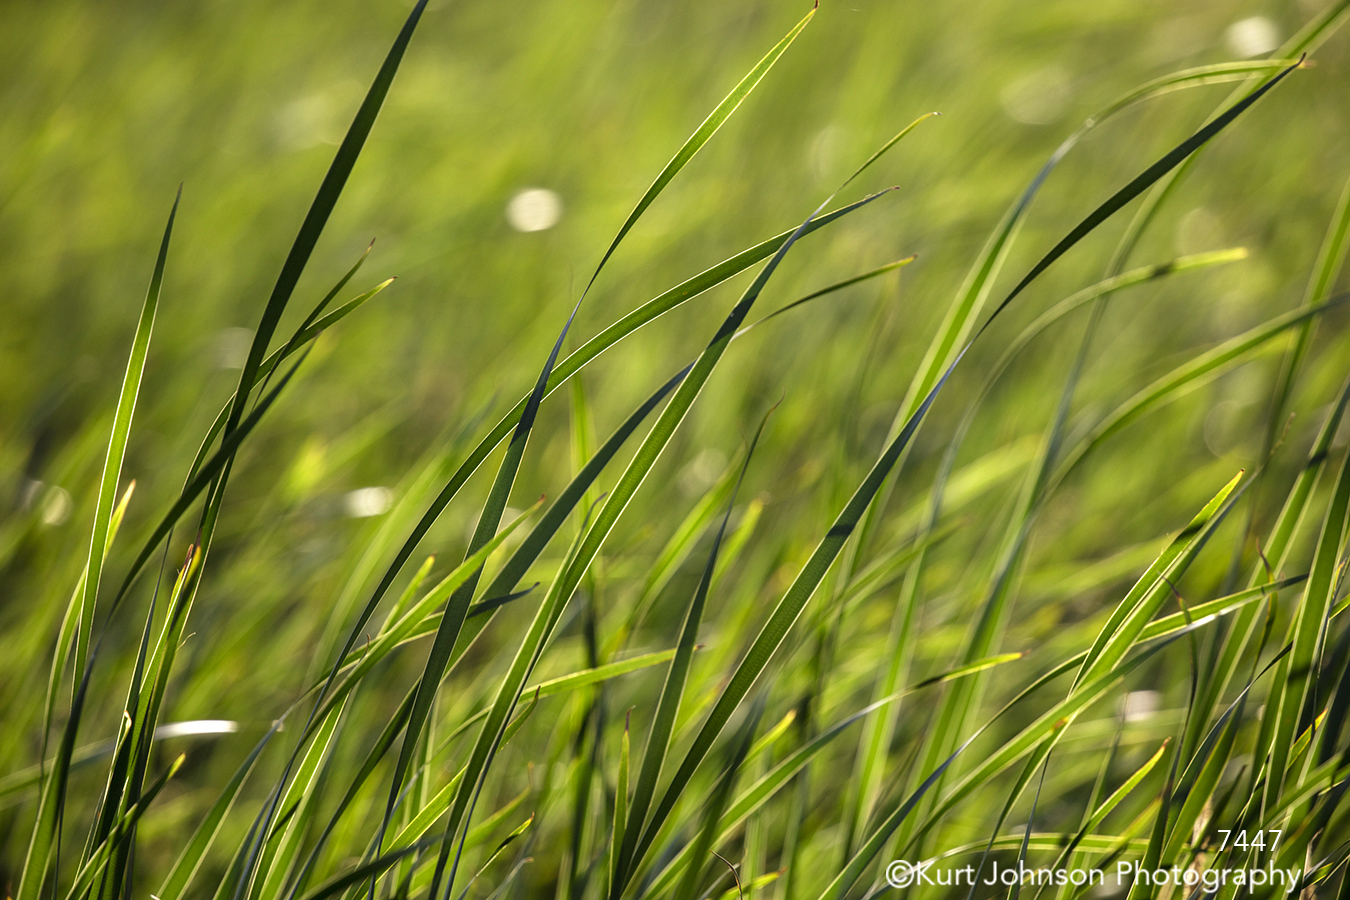 grass grasses green wet rain earth earth tones detail lines